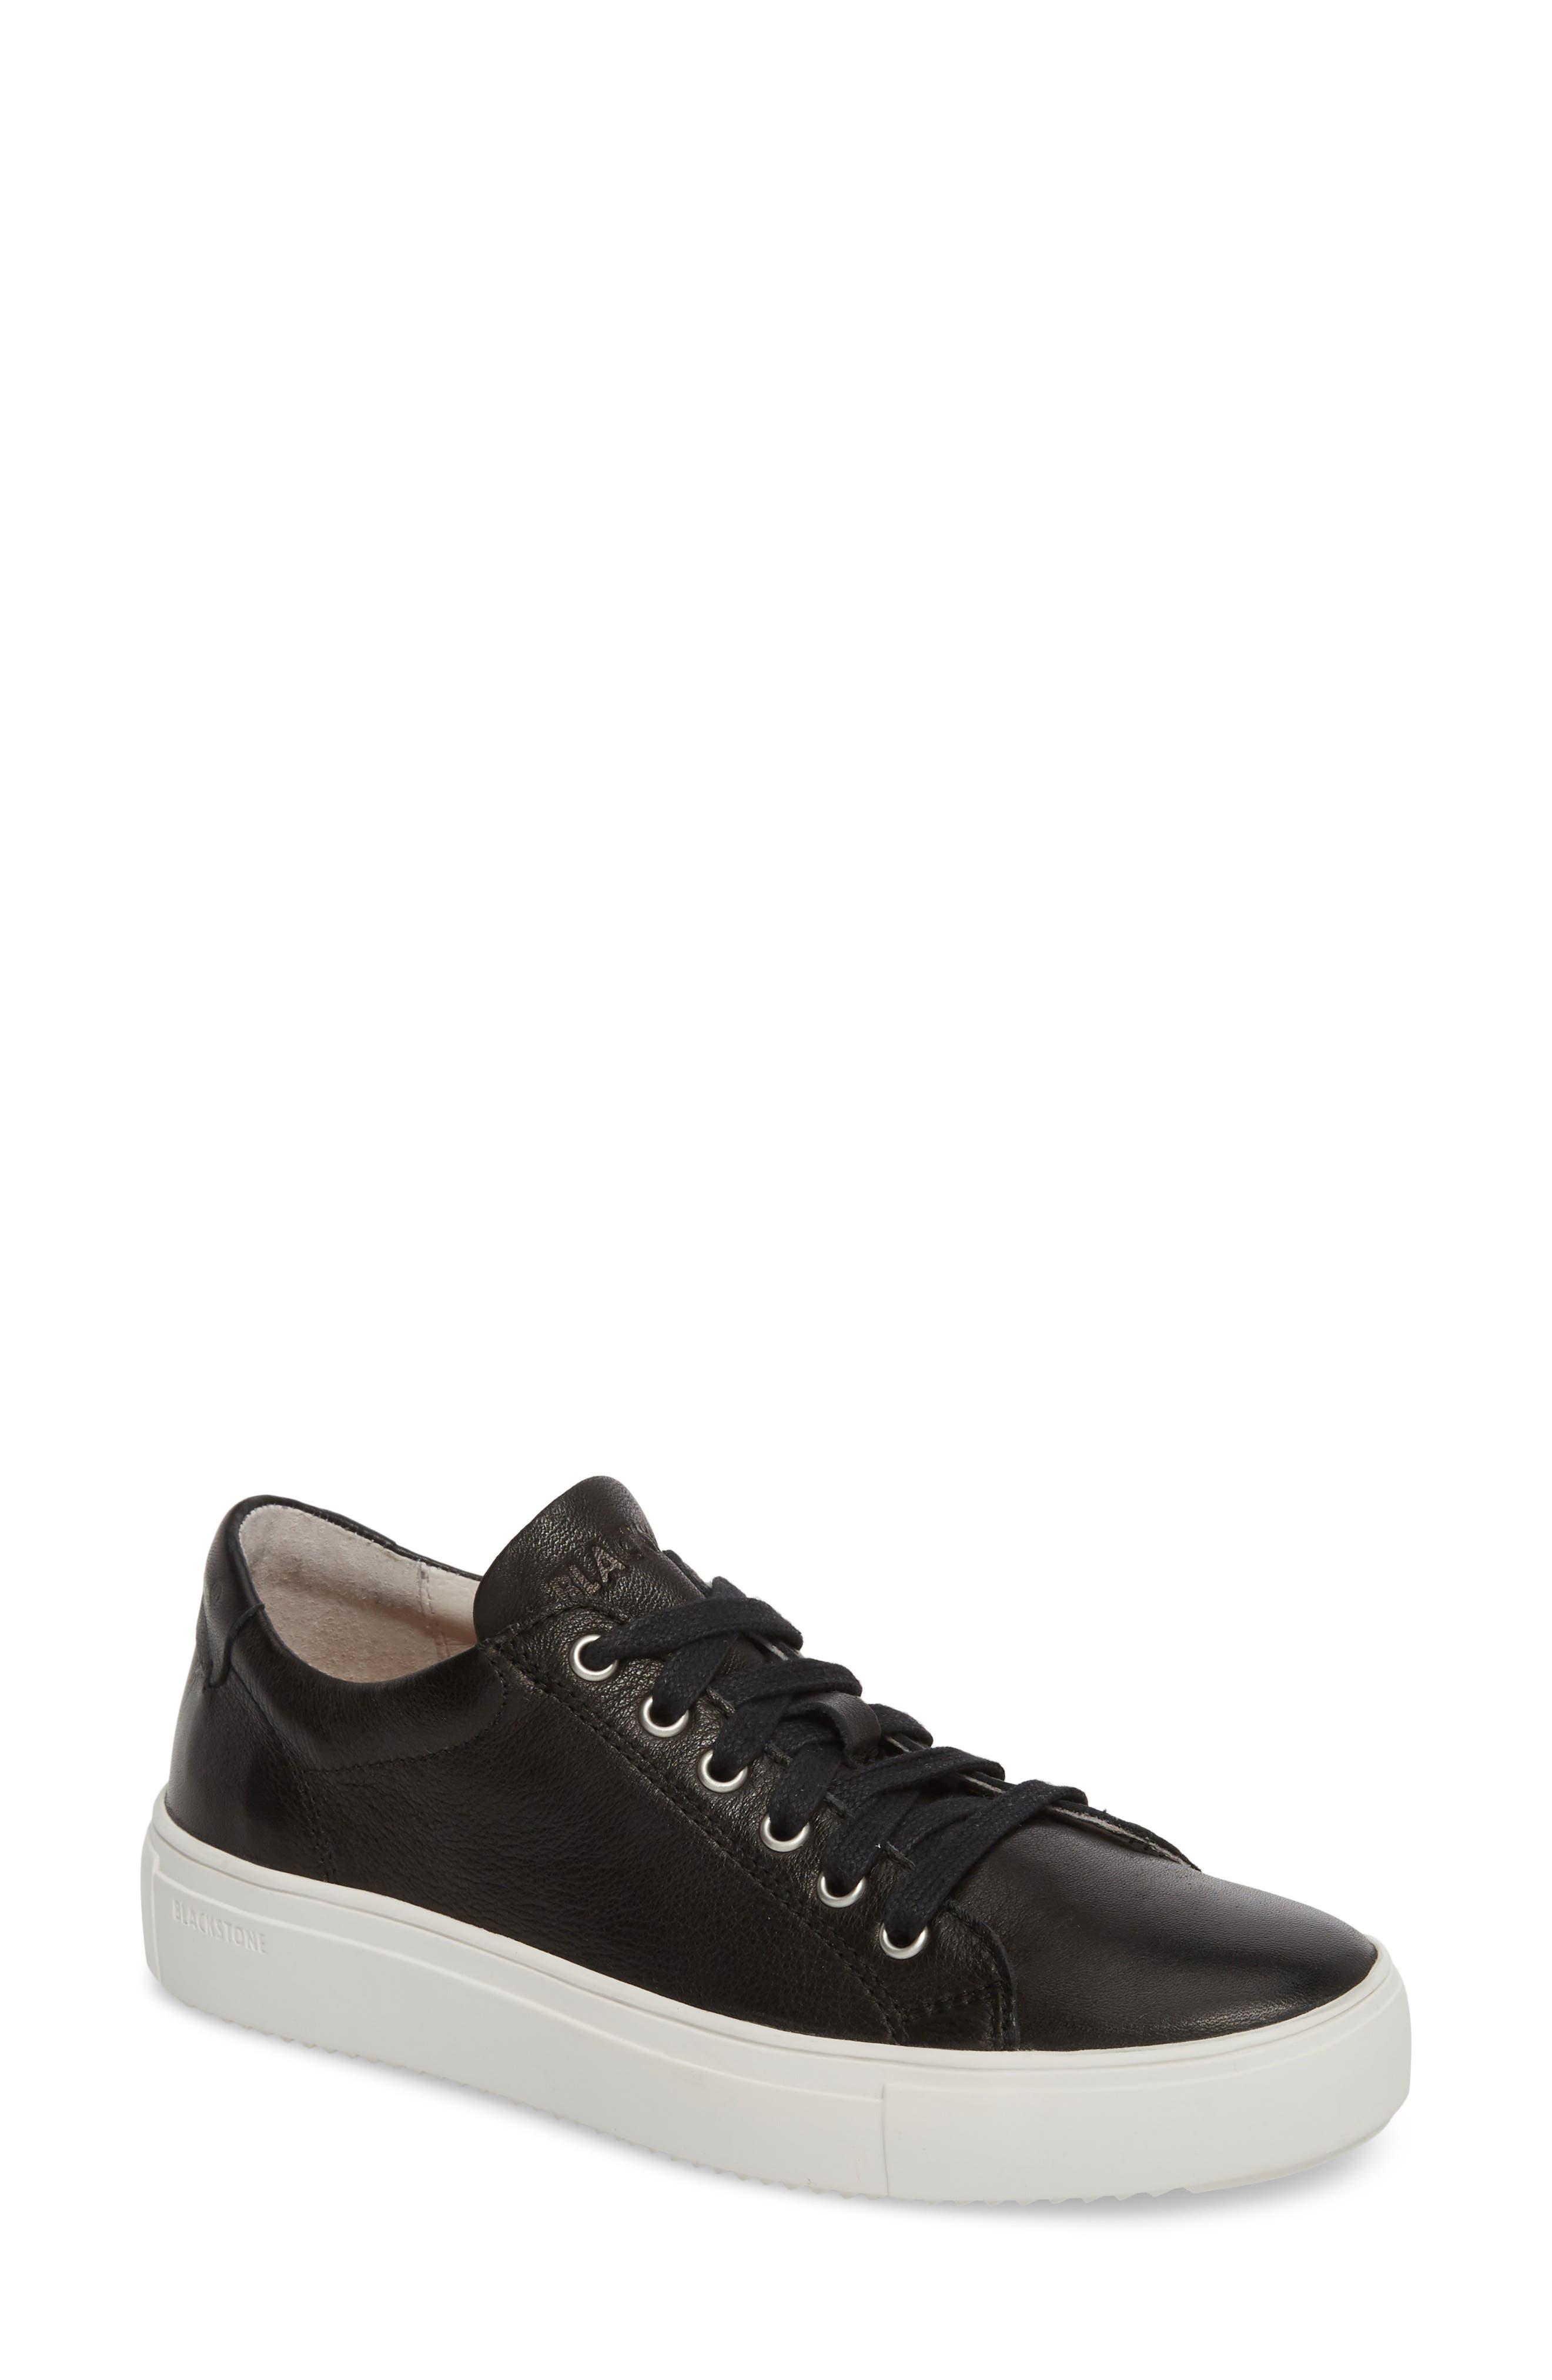 PL71 Low Top Sneaker,                             Main thumbnail 1, color,                             BLACK LEATHER